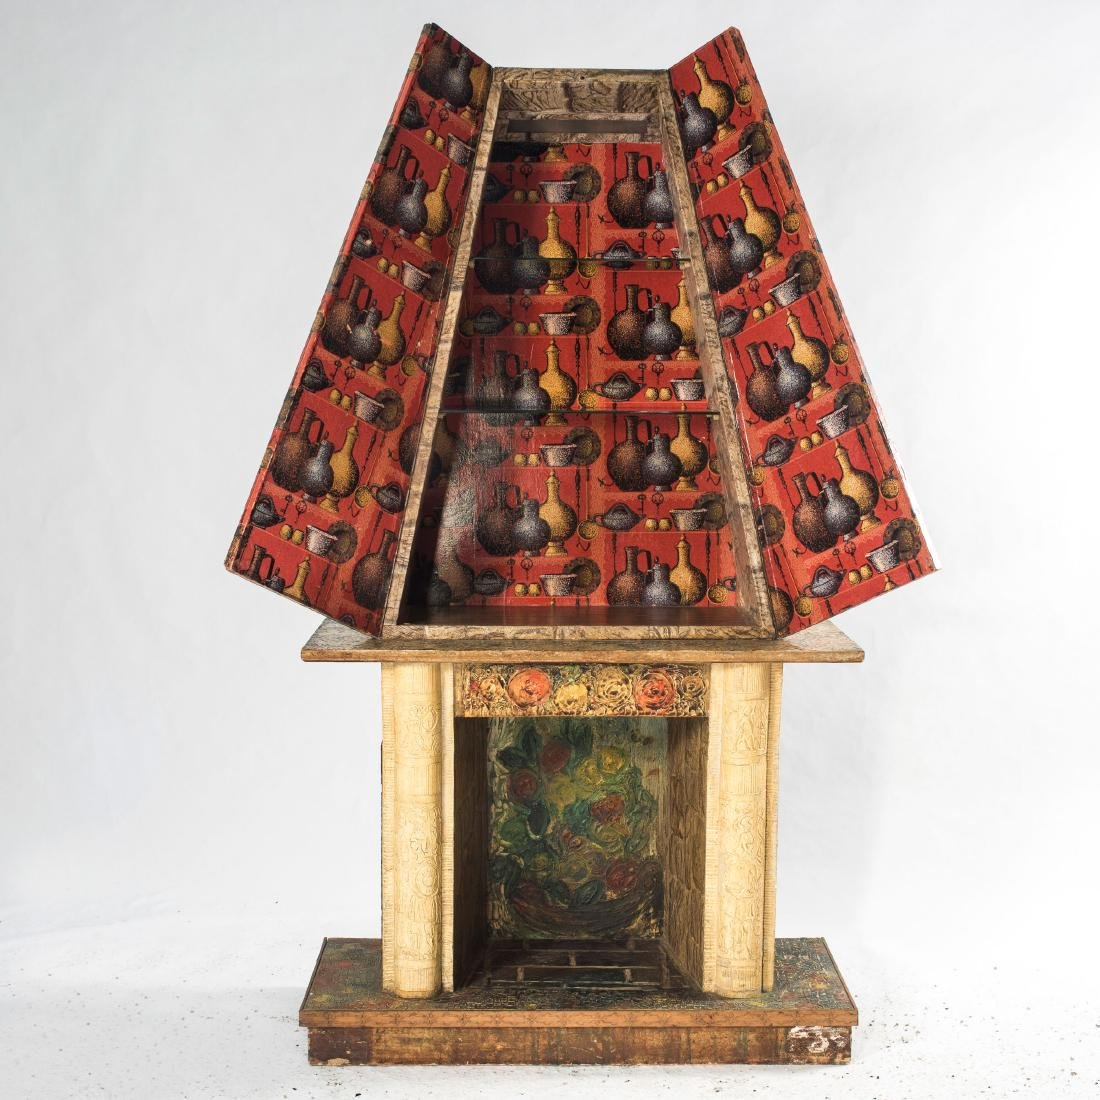 'Fireplace' liquor cabinet, 1950s - 6